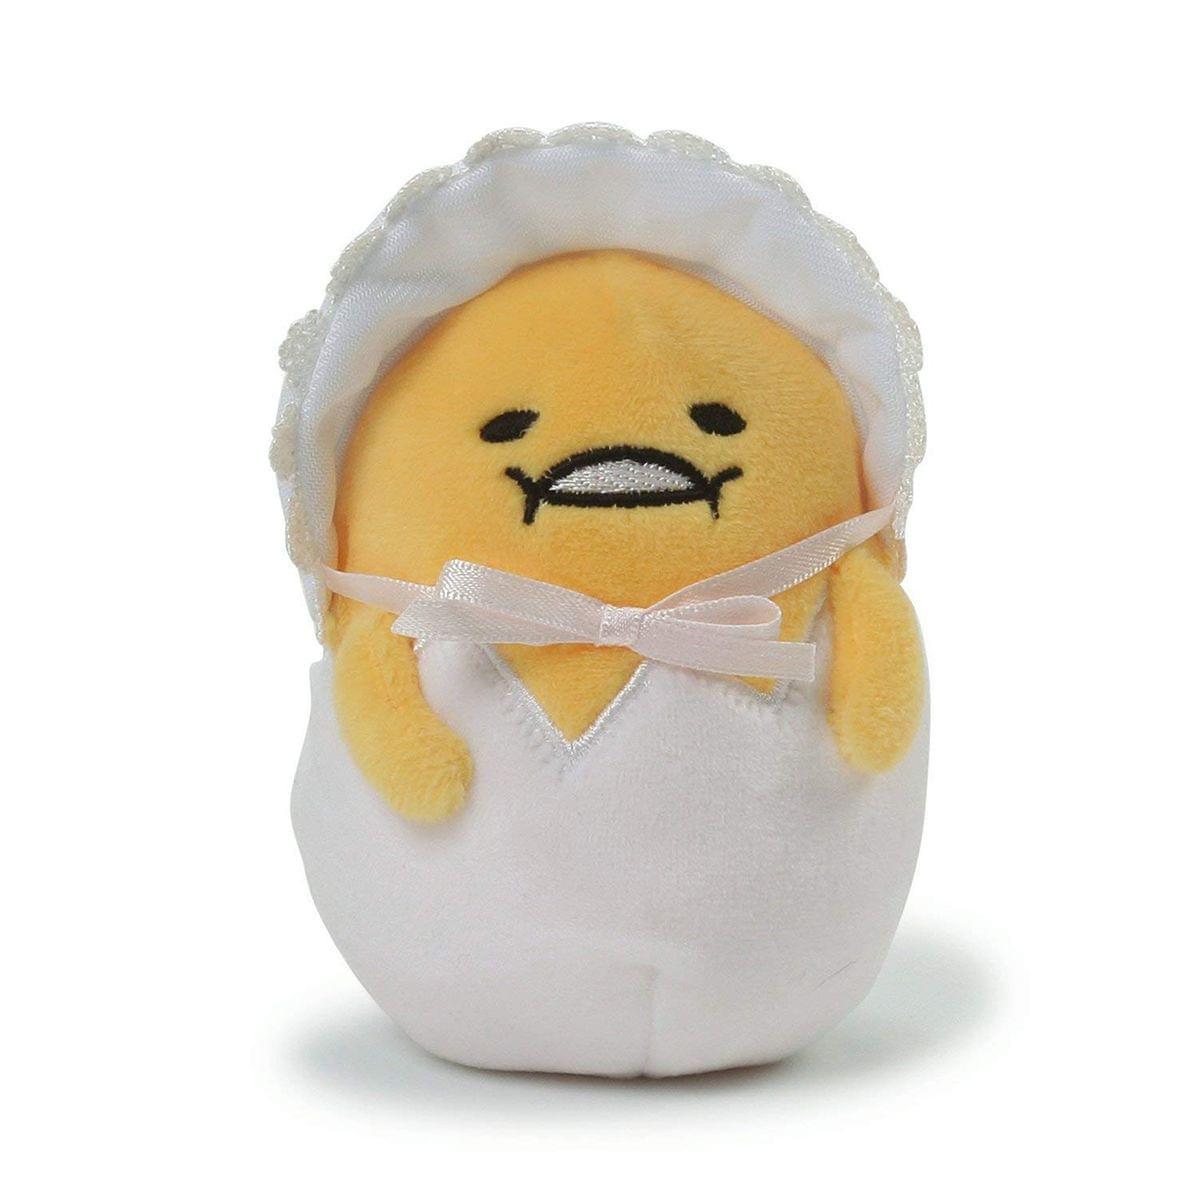 Baby Gudetama the Lazy Egg 4.5-Inch Plush